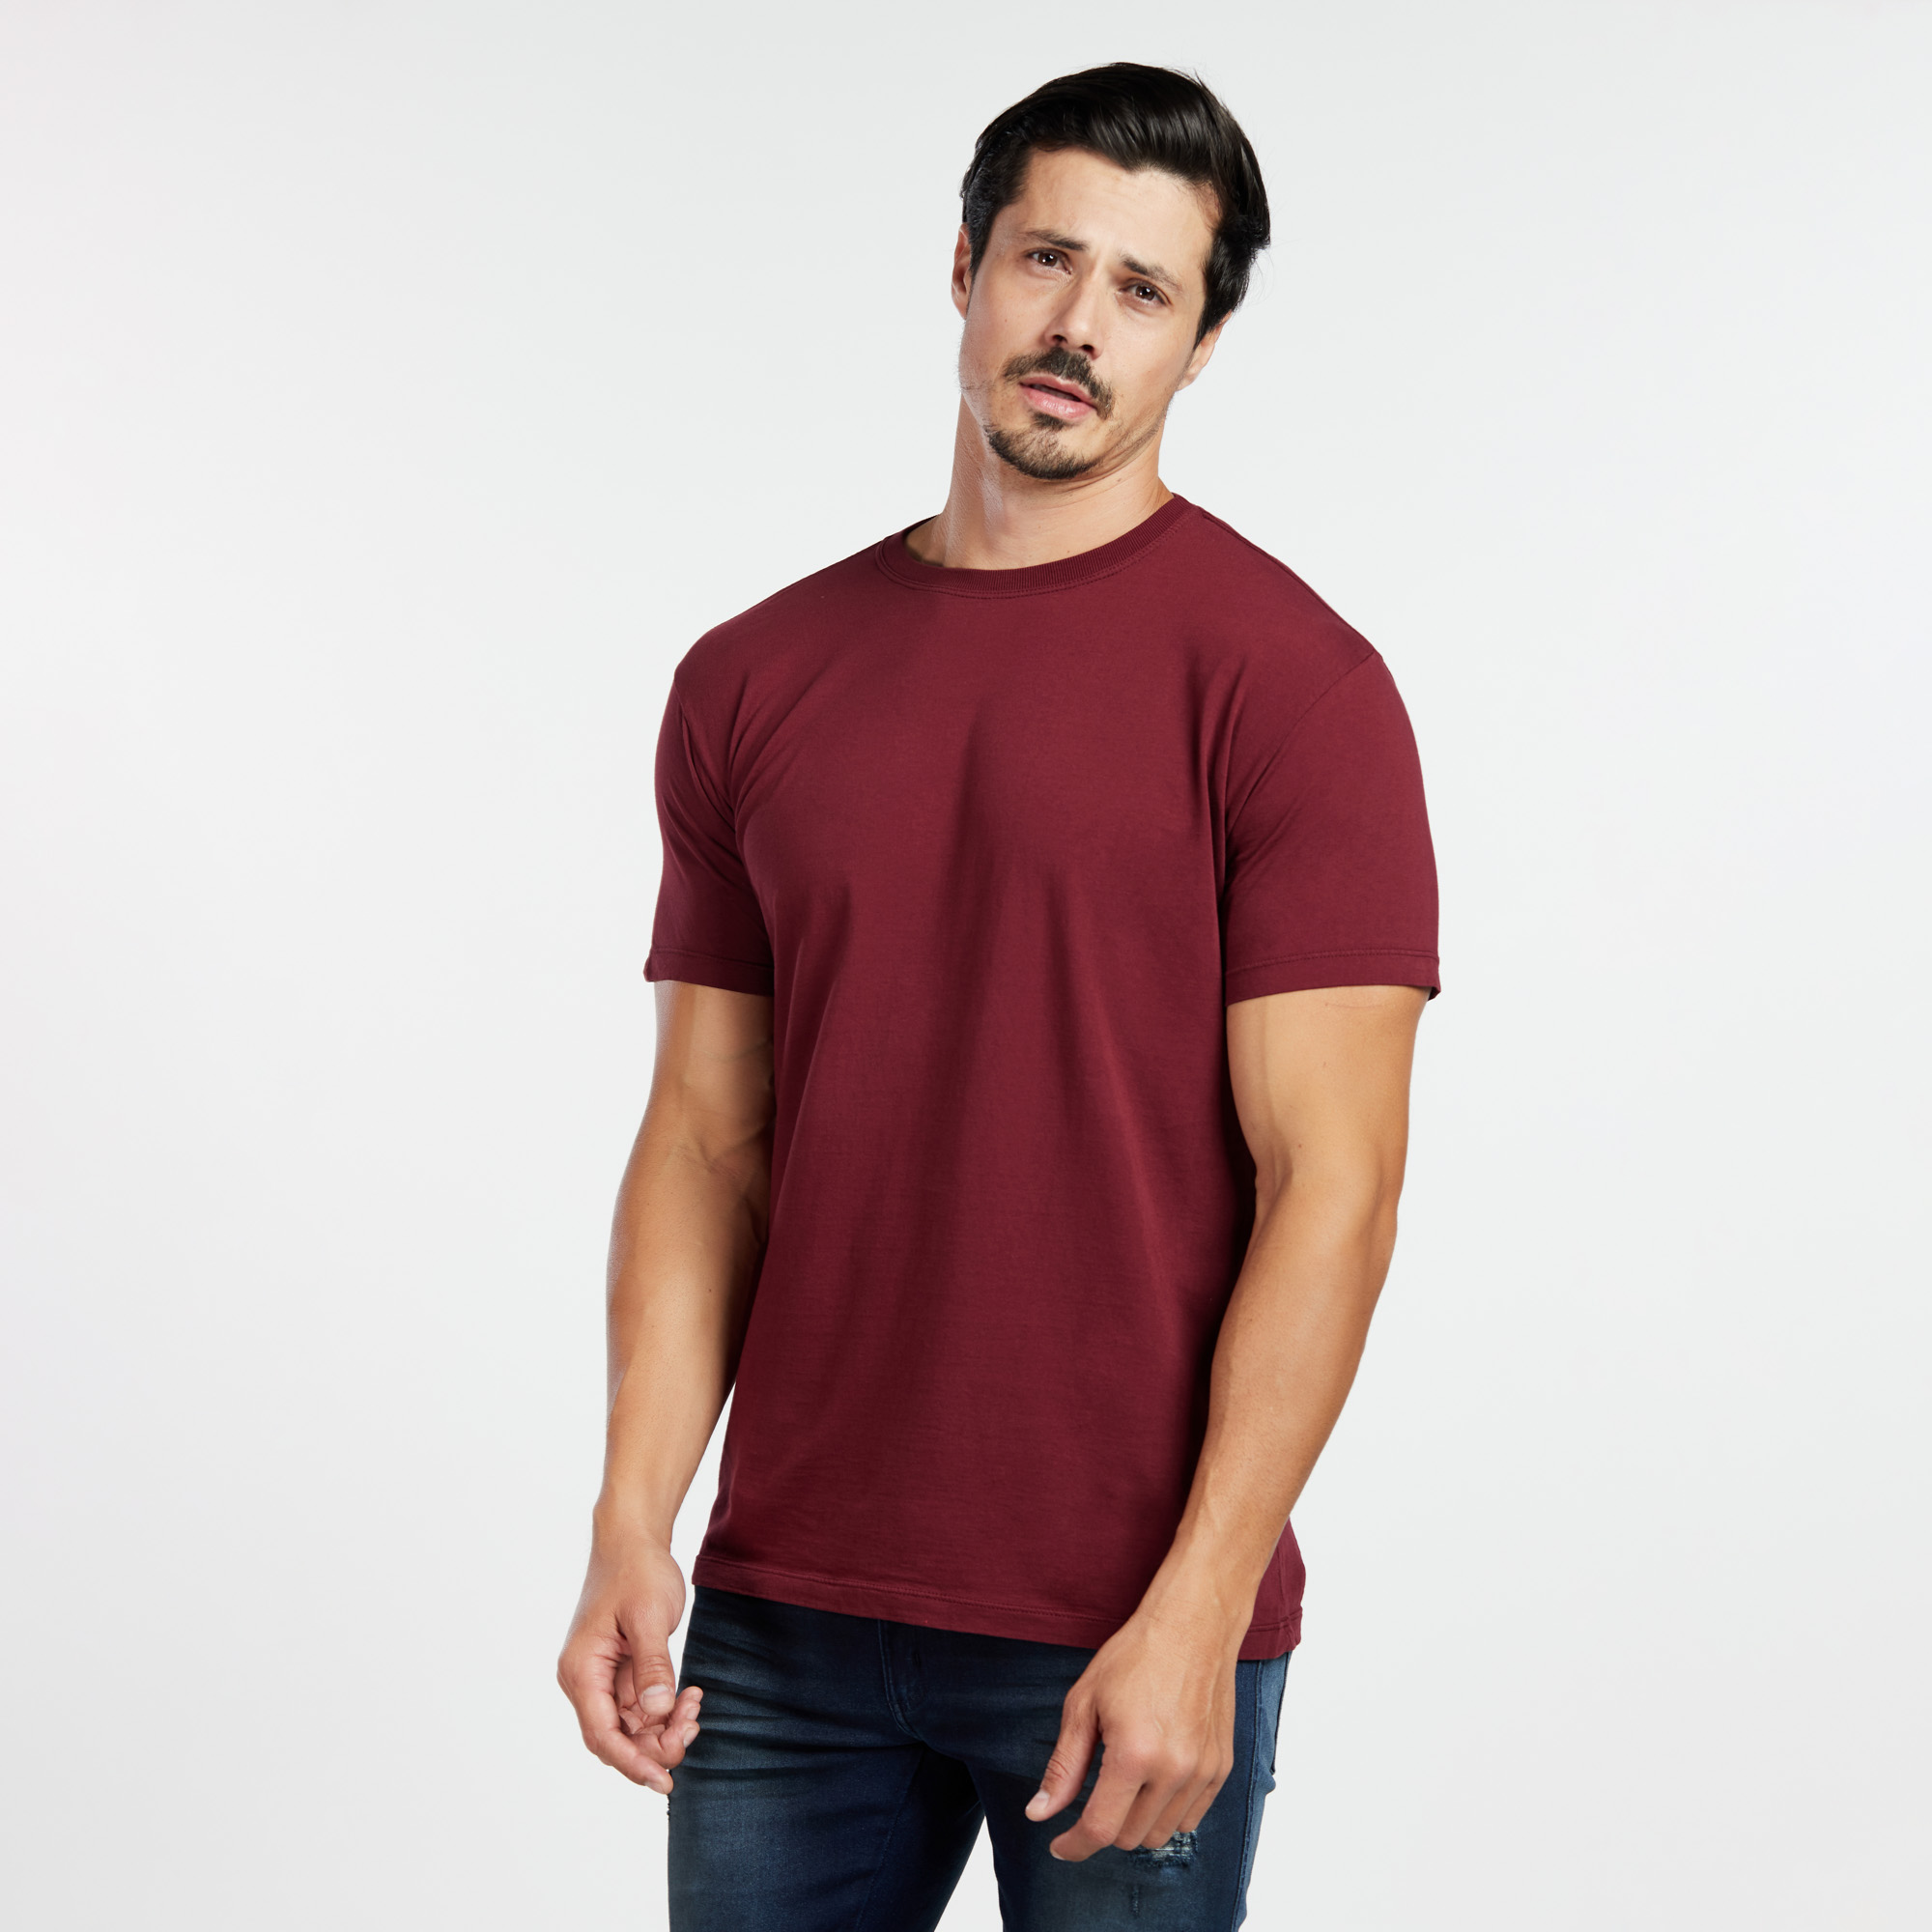 Camiseta Masculina Reativo Bordo